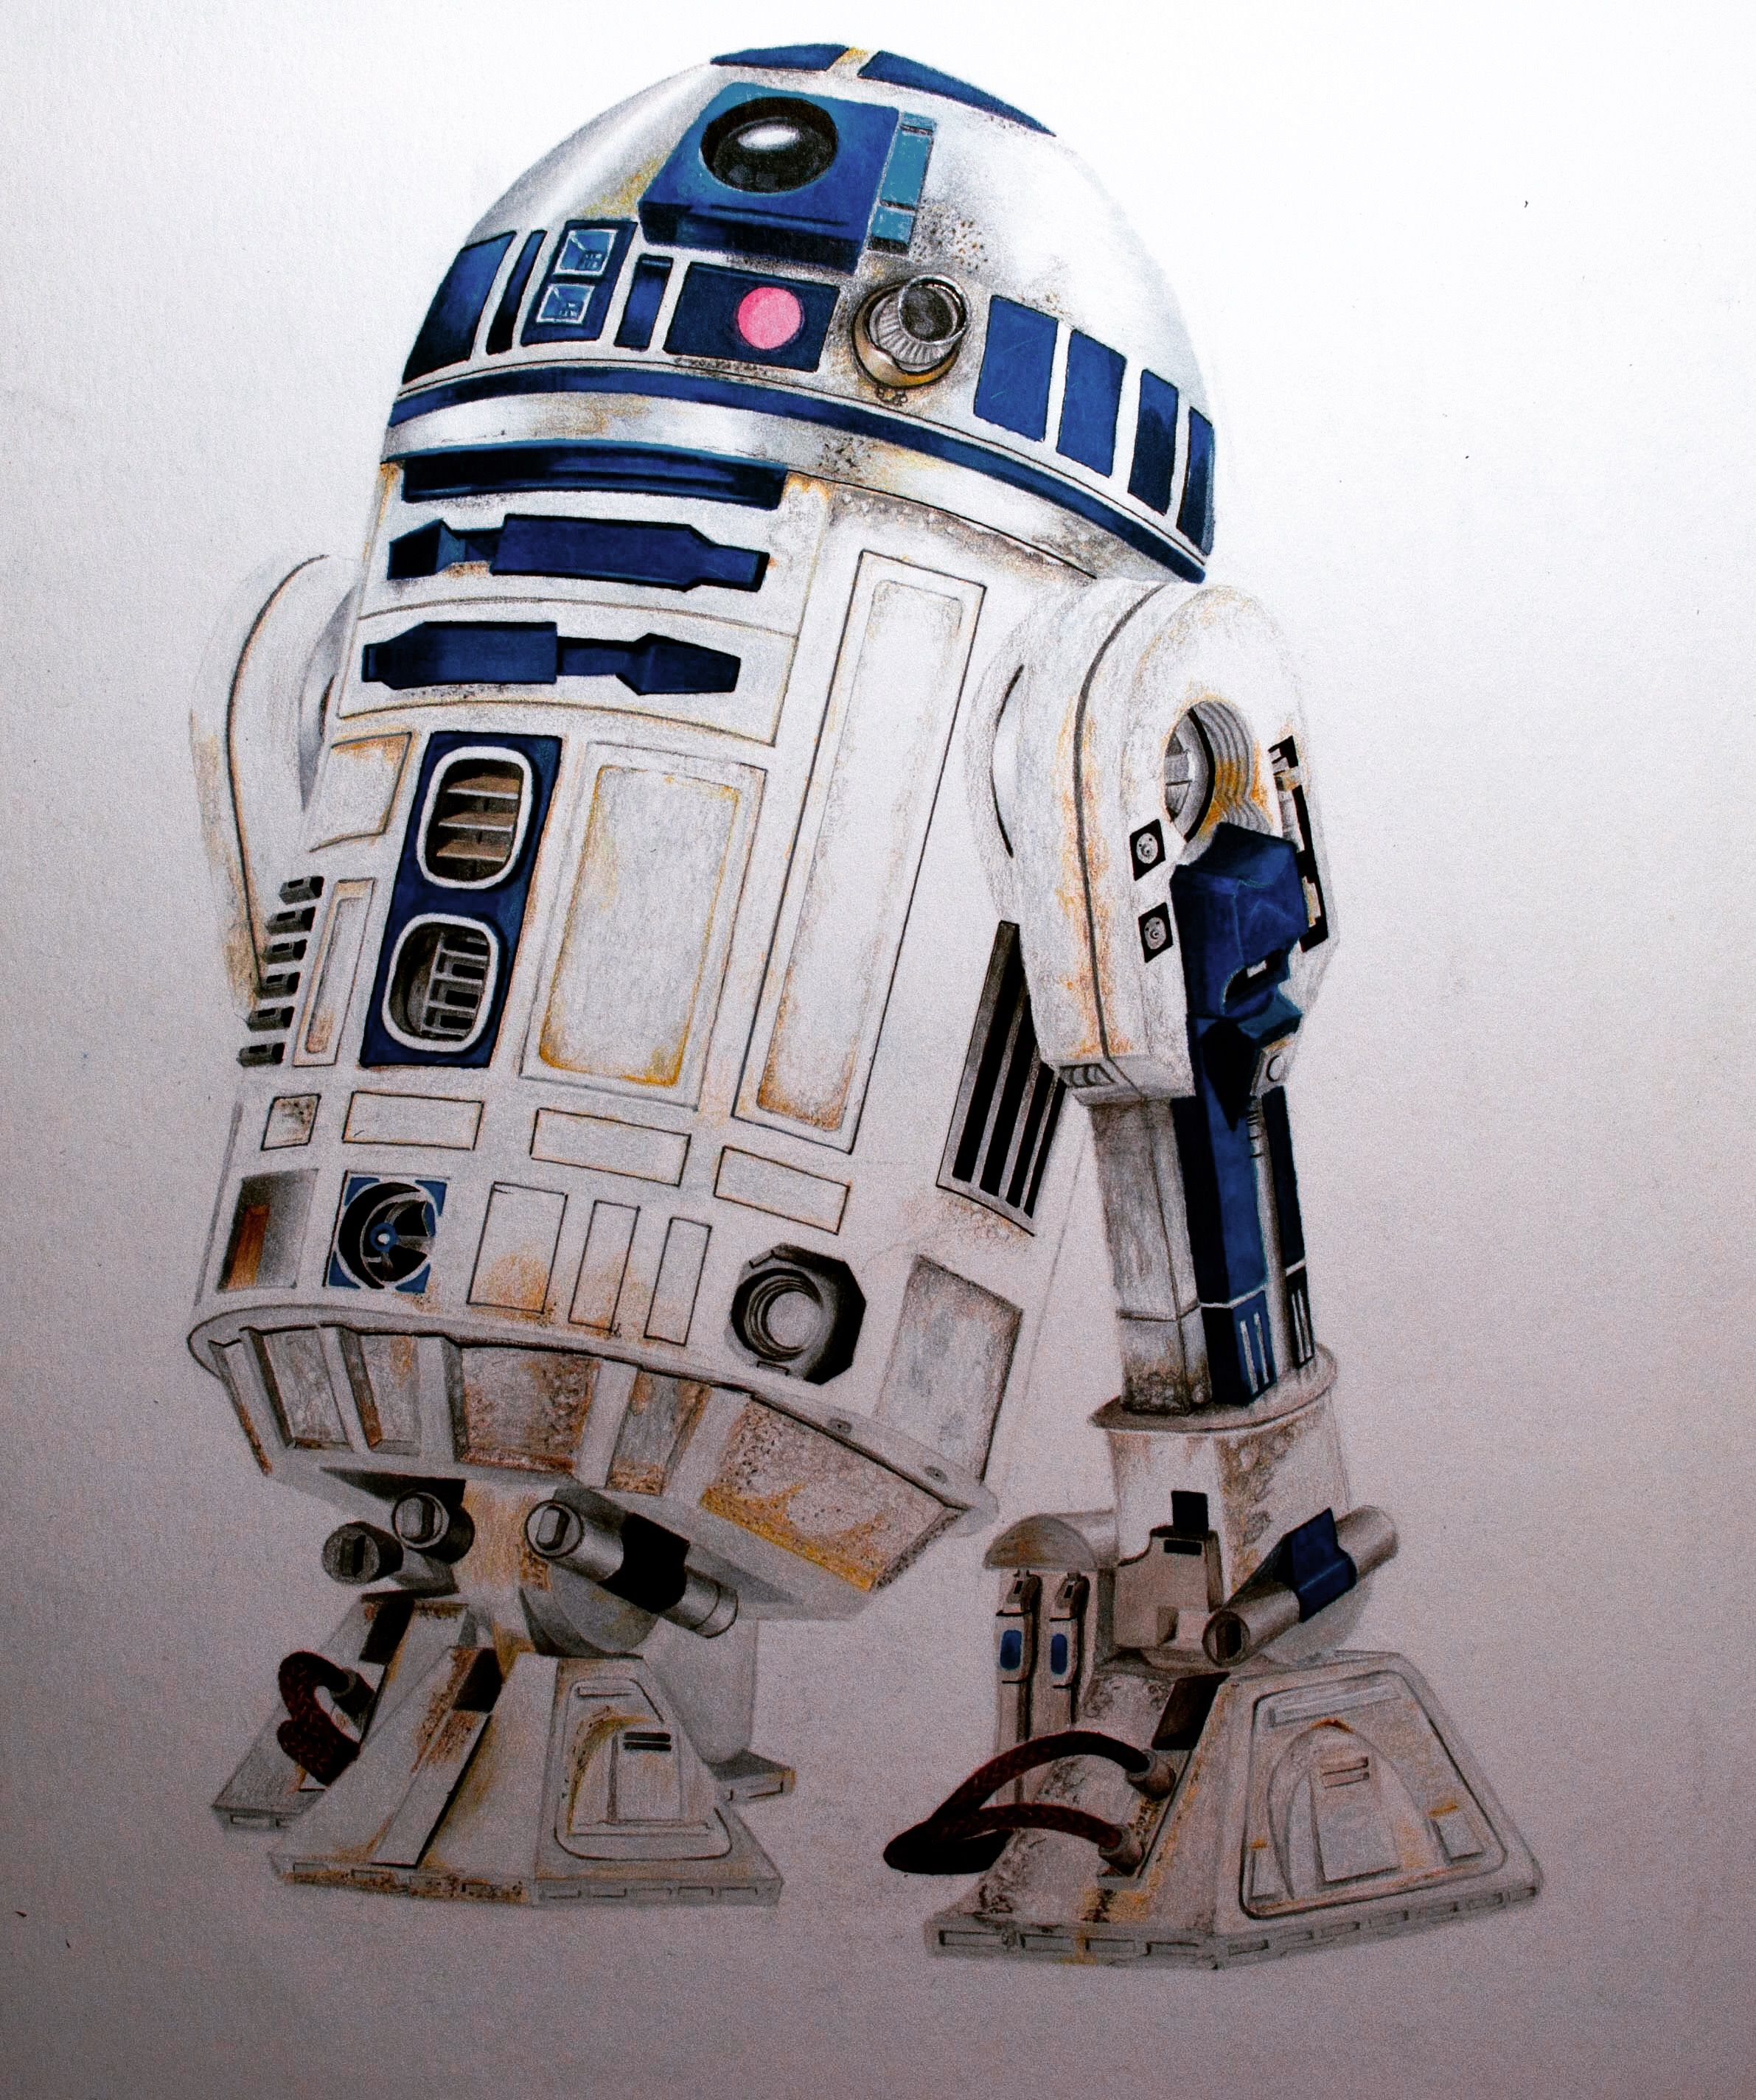 R2-D2 Last Image